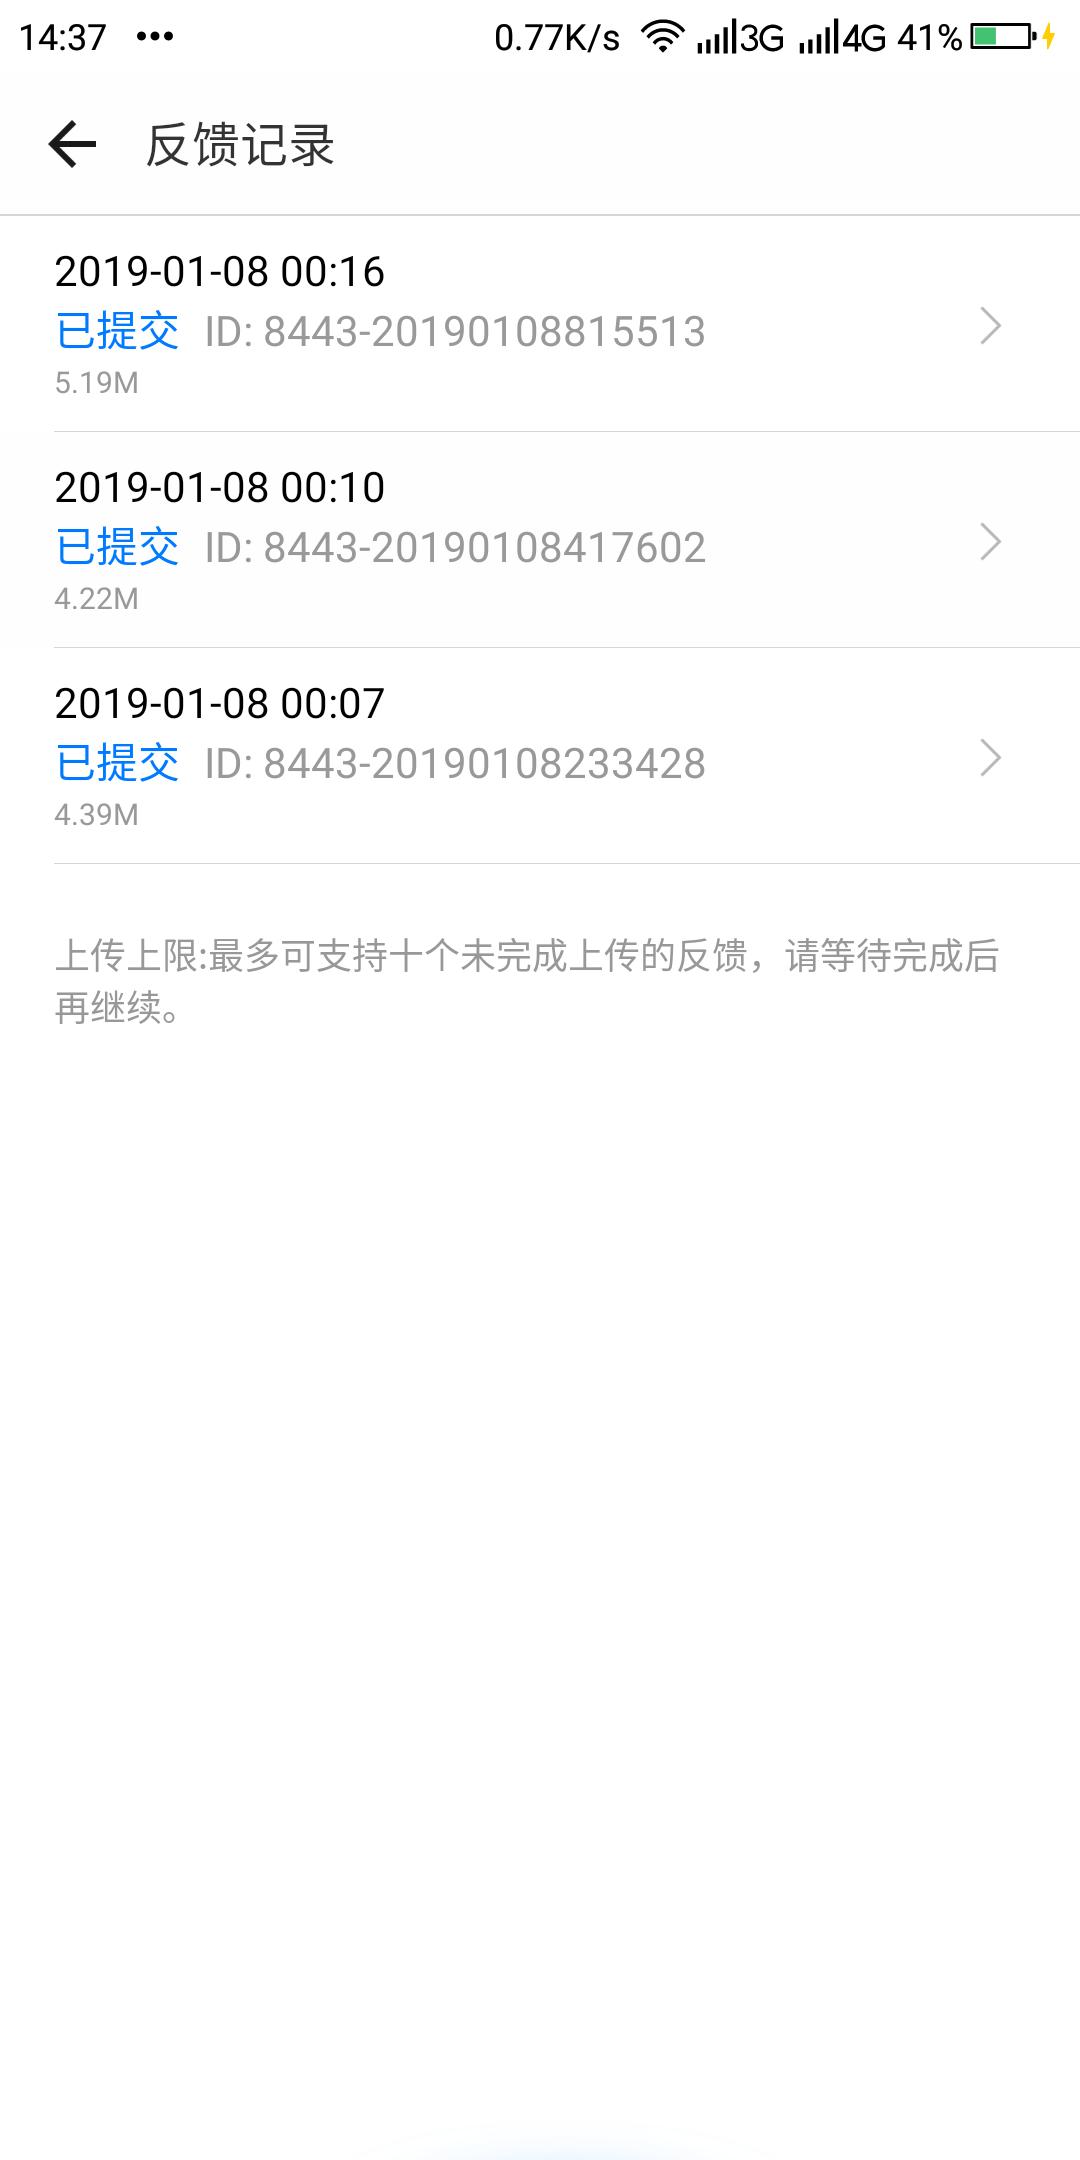 Screenshot_2019-02-15-14-37-54.png